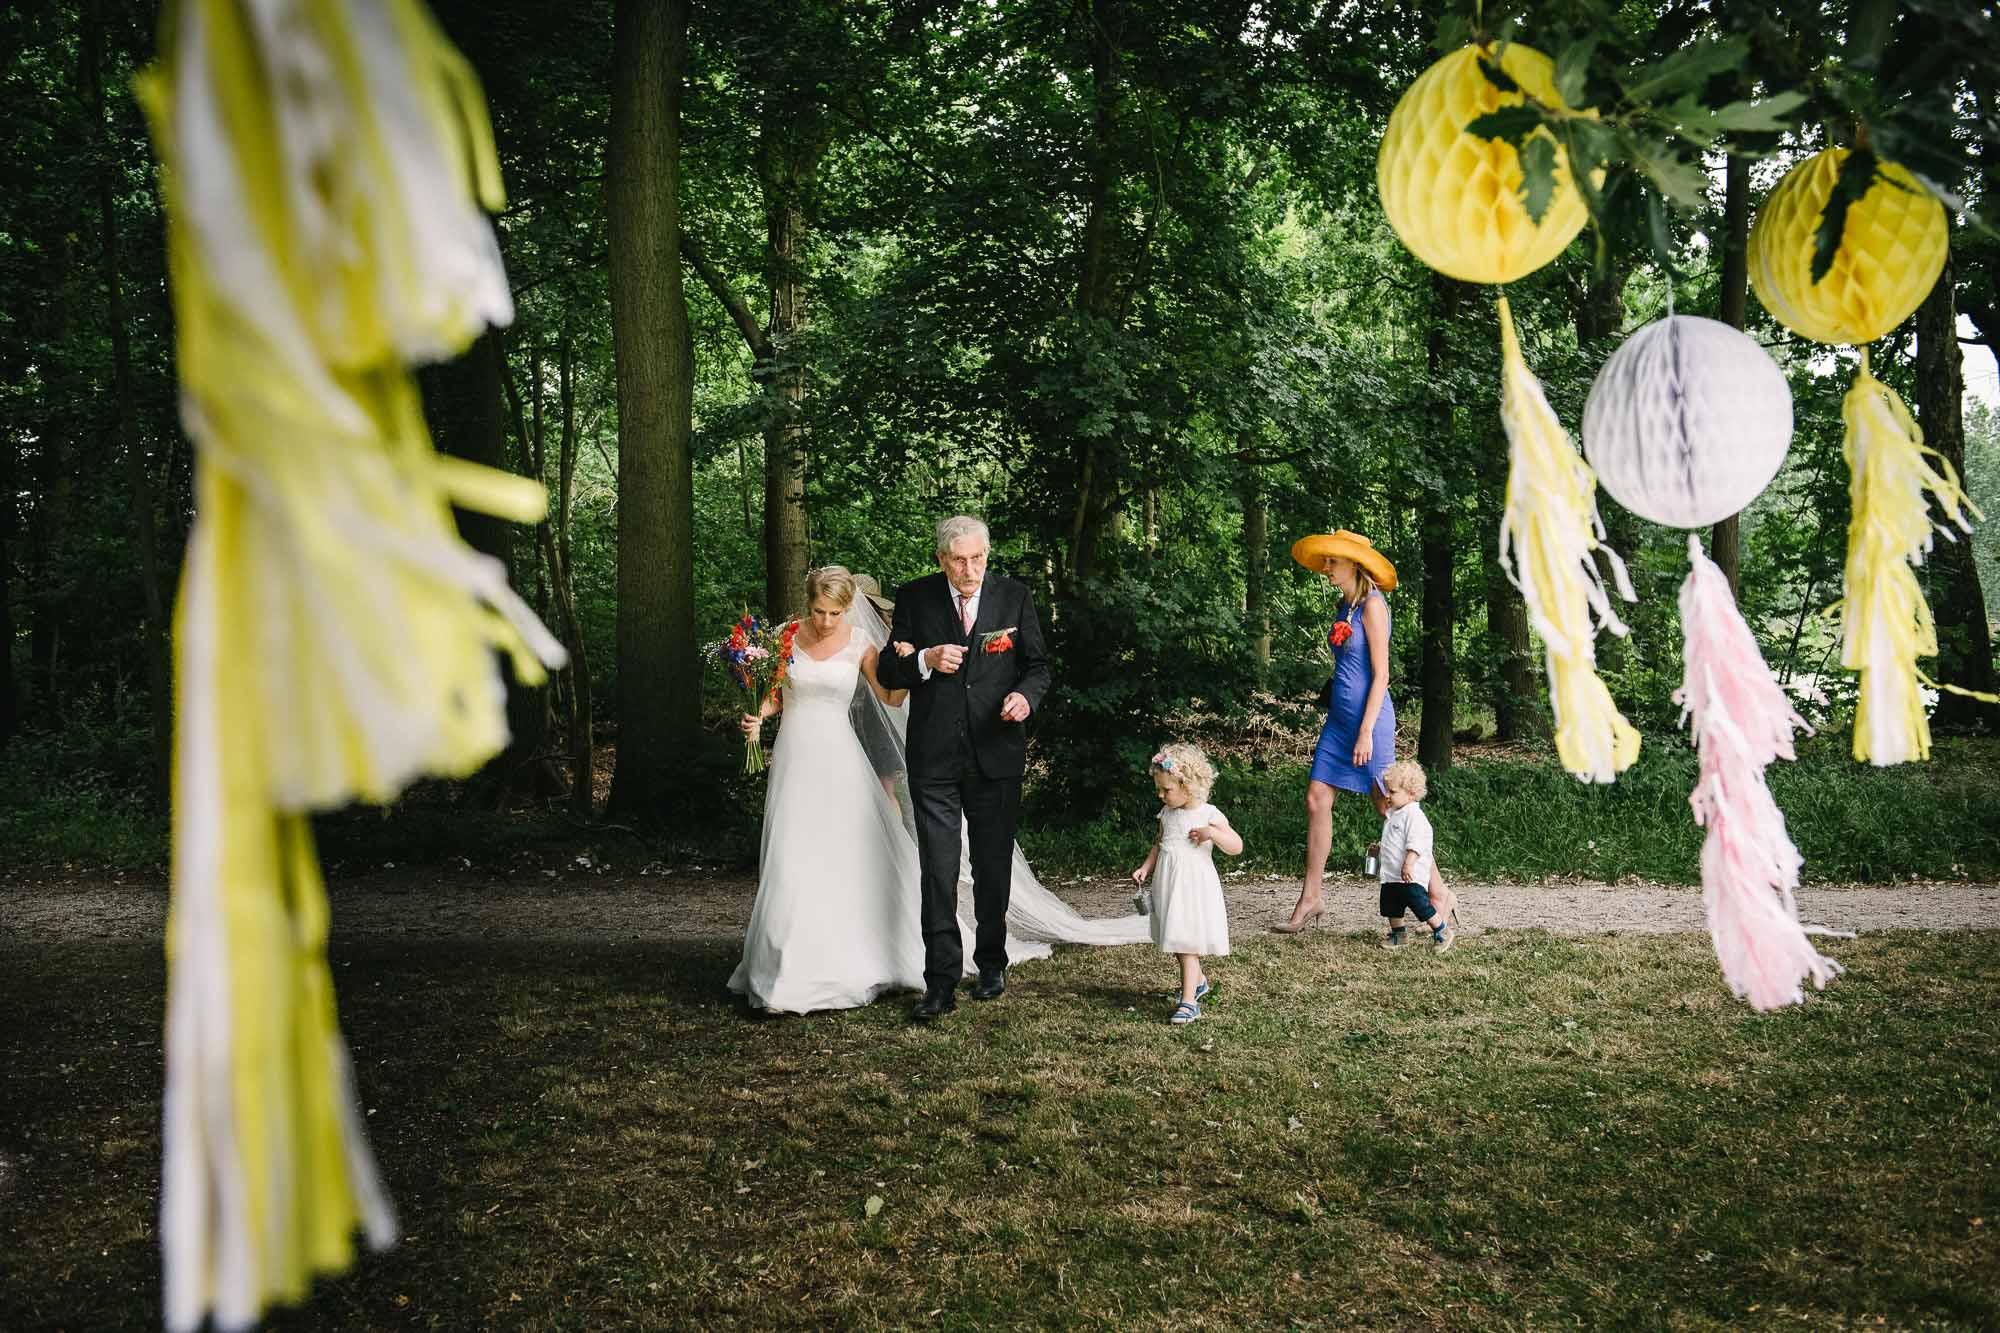 buitenbruiloft Leiden trouwen buiten fotograaf